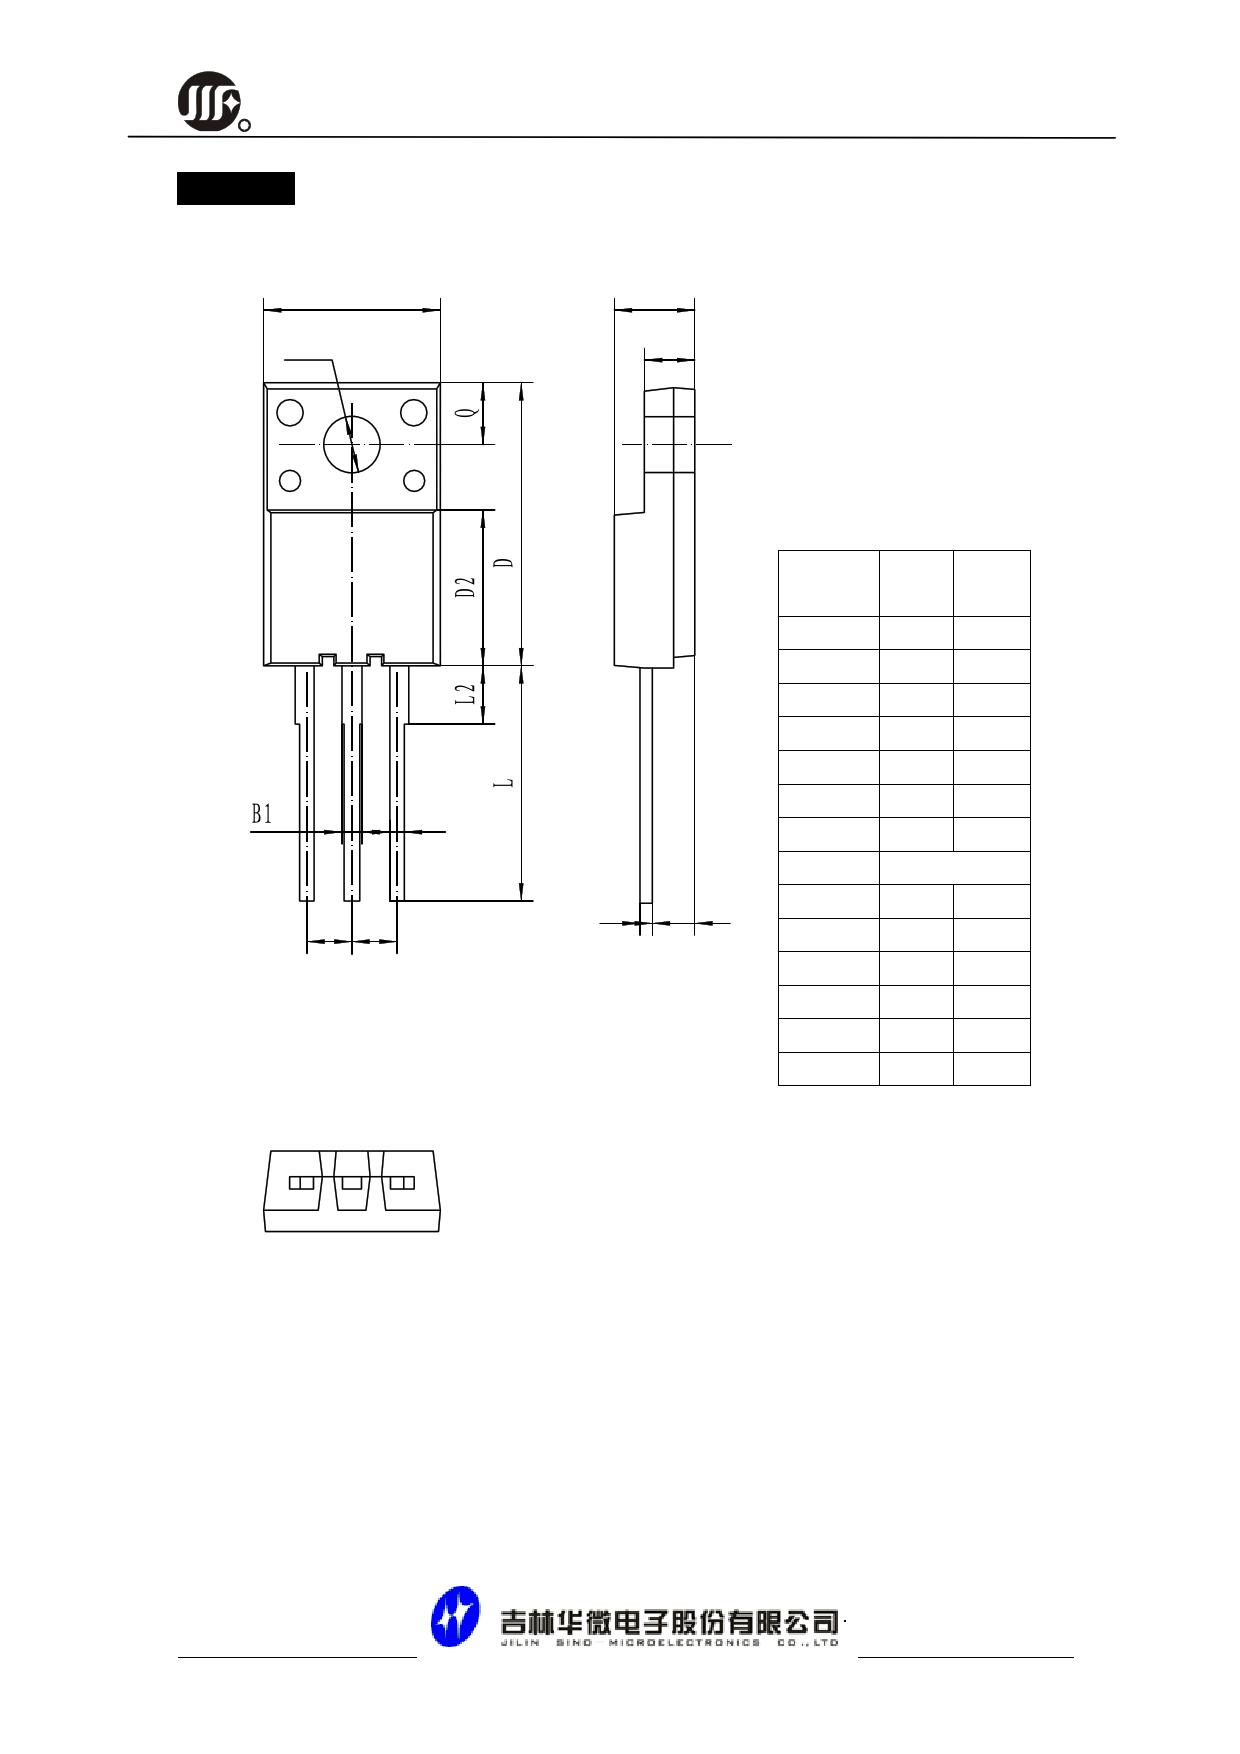 sbl3040szr datasheet pdf   pinout